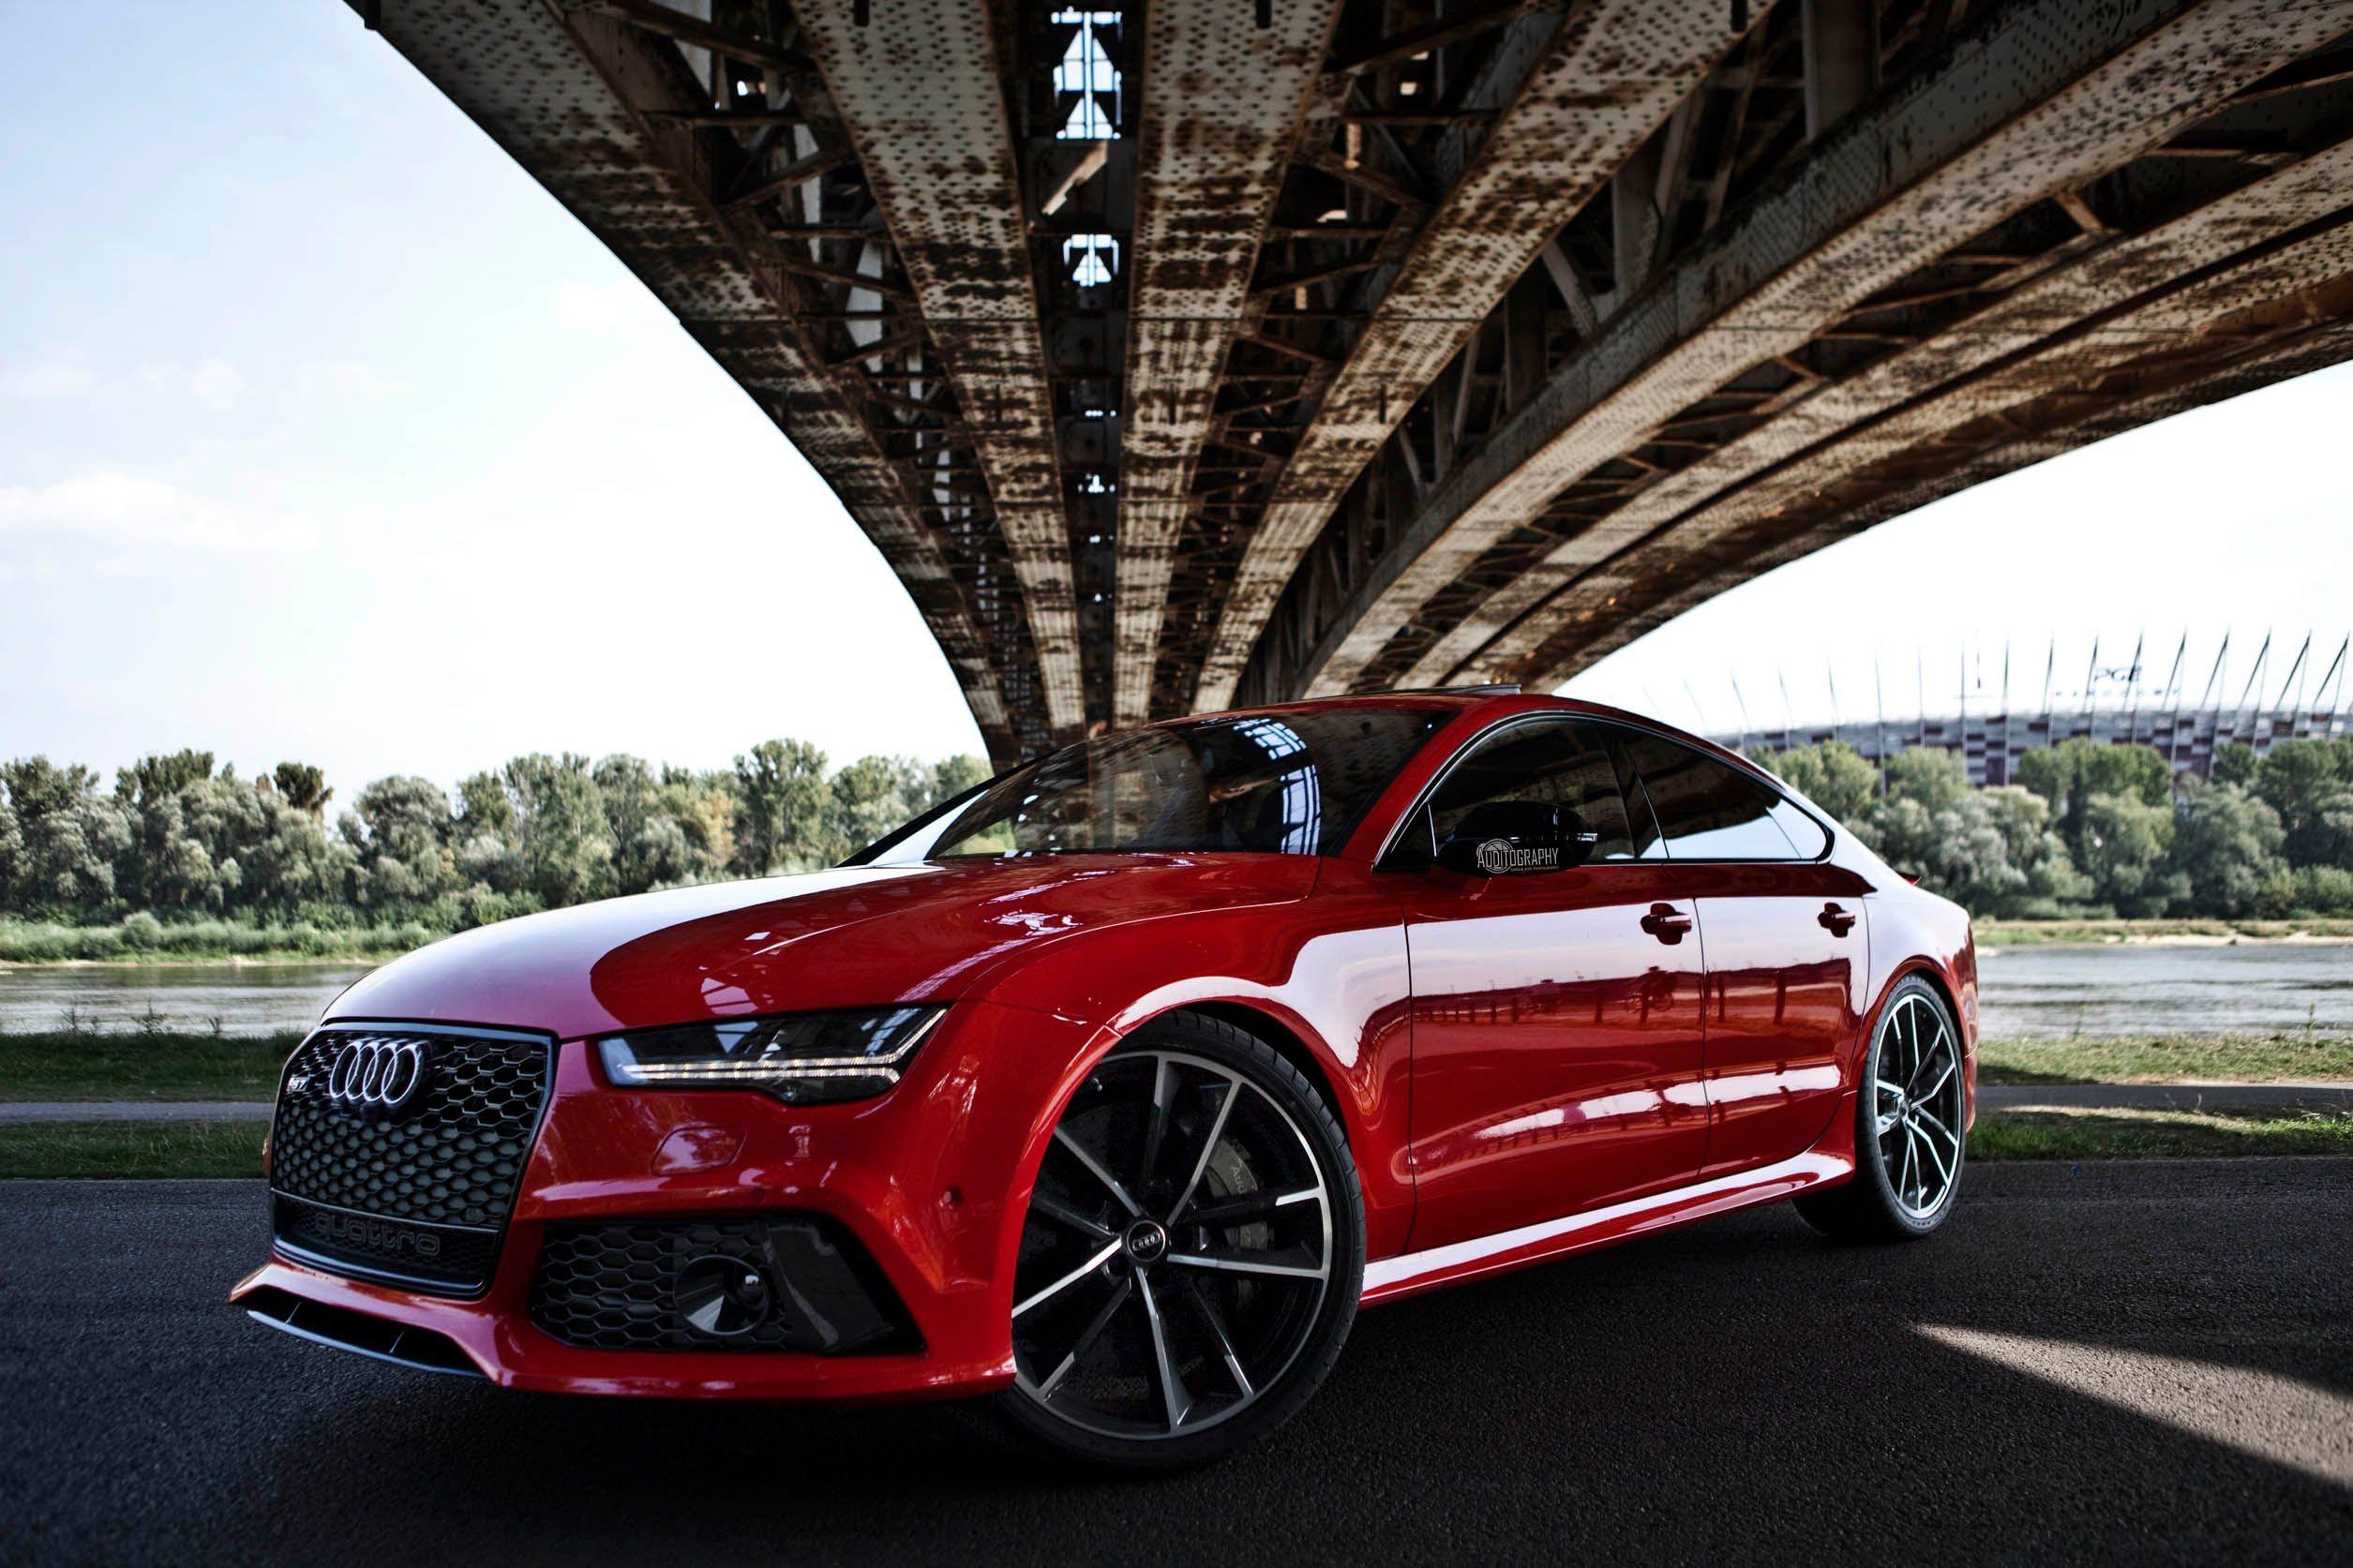 2017 605hp Audi Rs7 Performance Details Launch Acceleration Interior Red Audi Audi Rs7 Sportback Audi Rs7